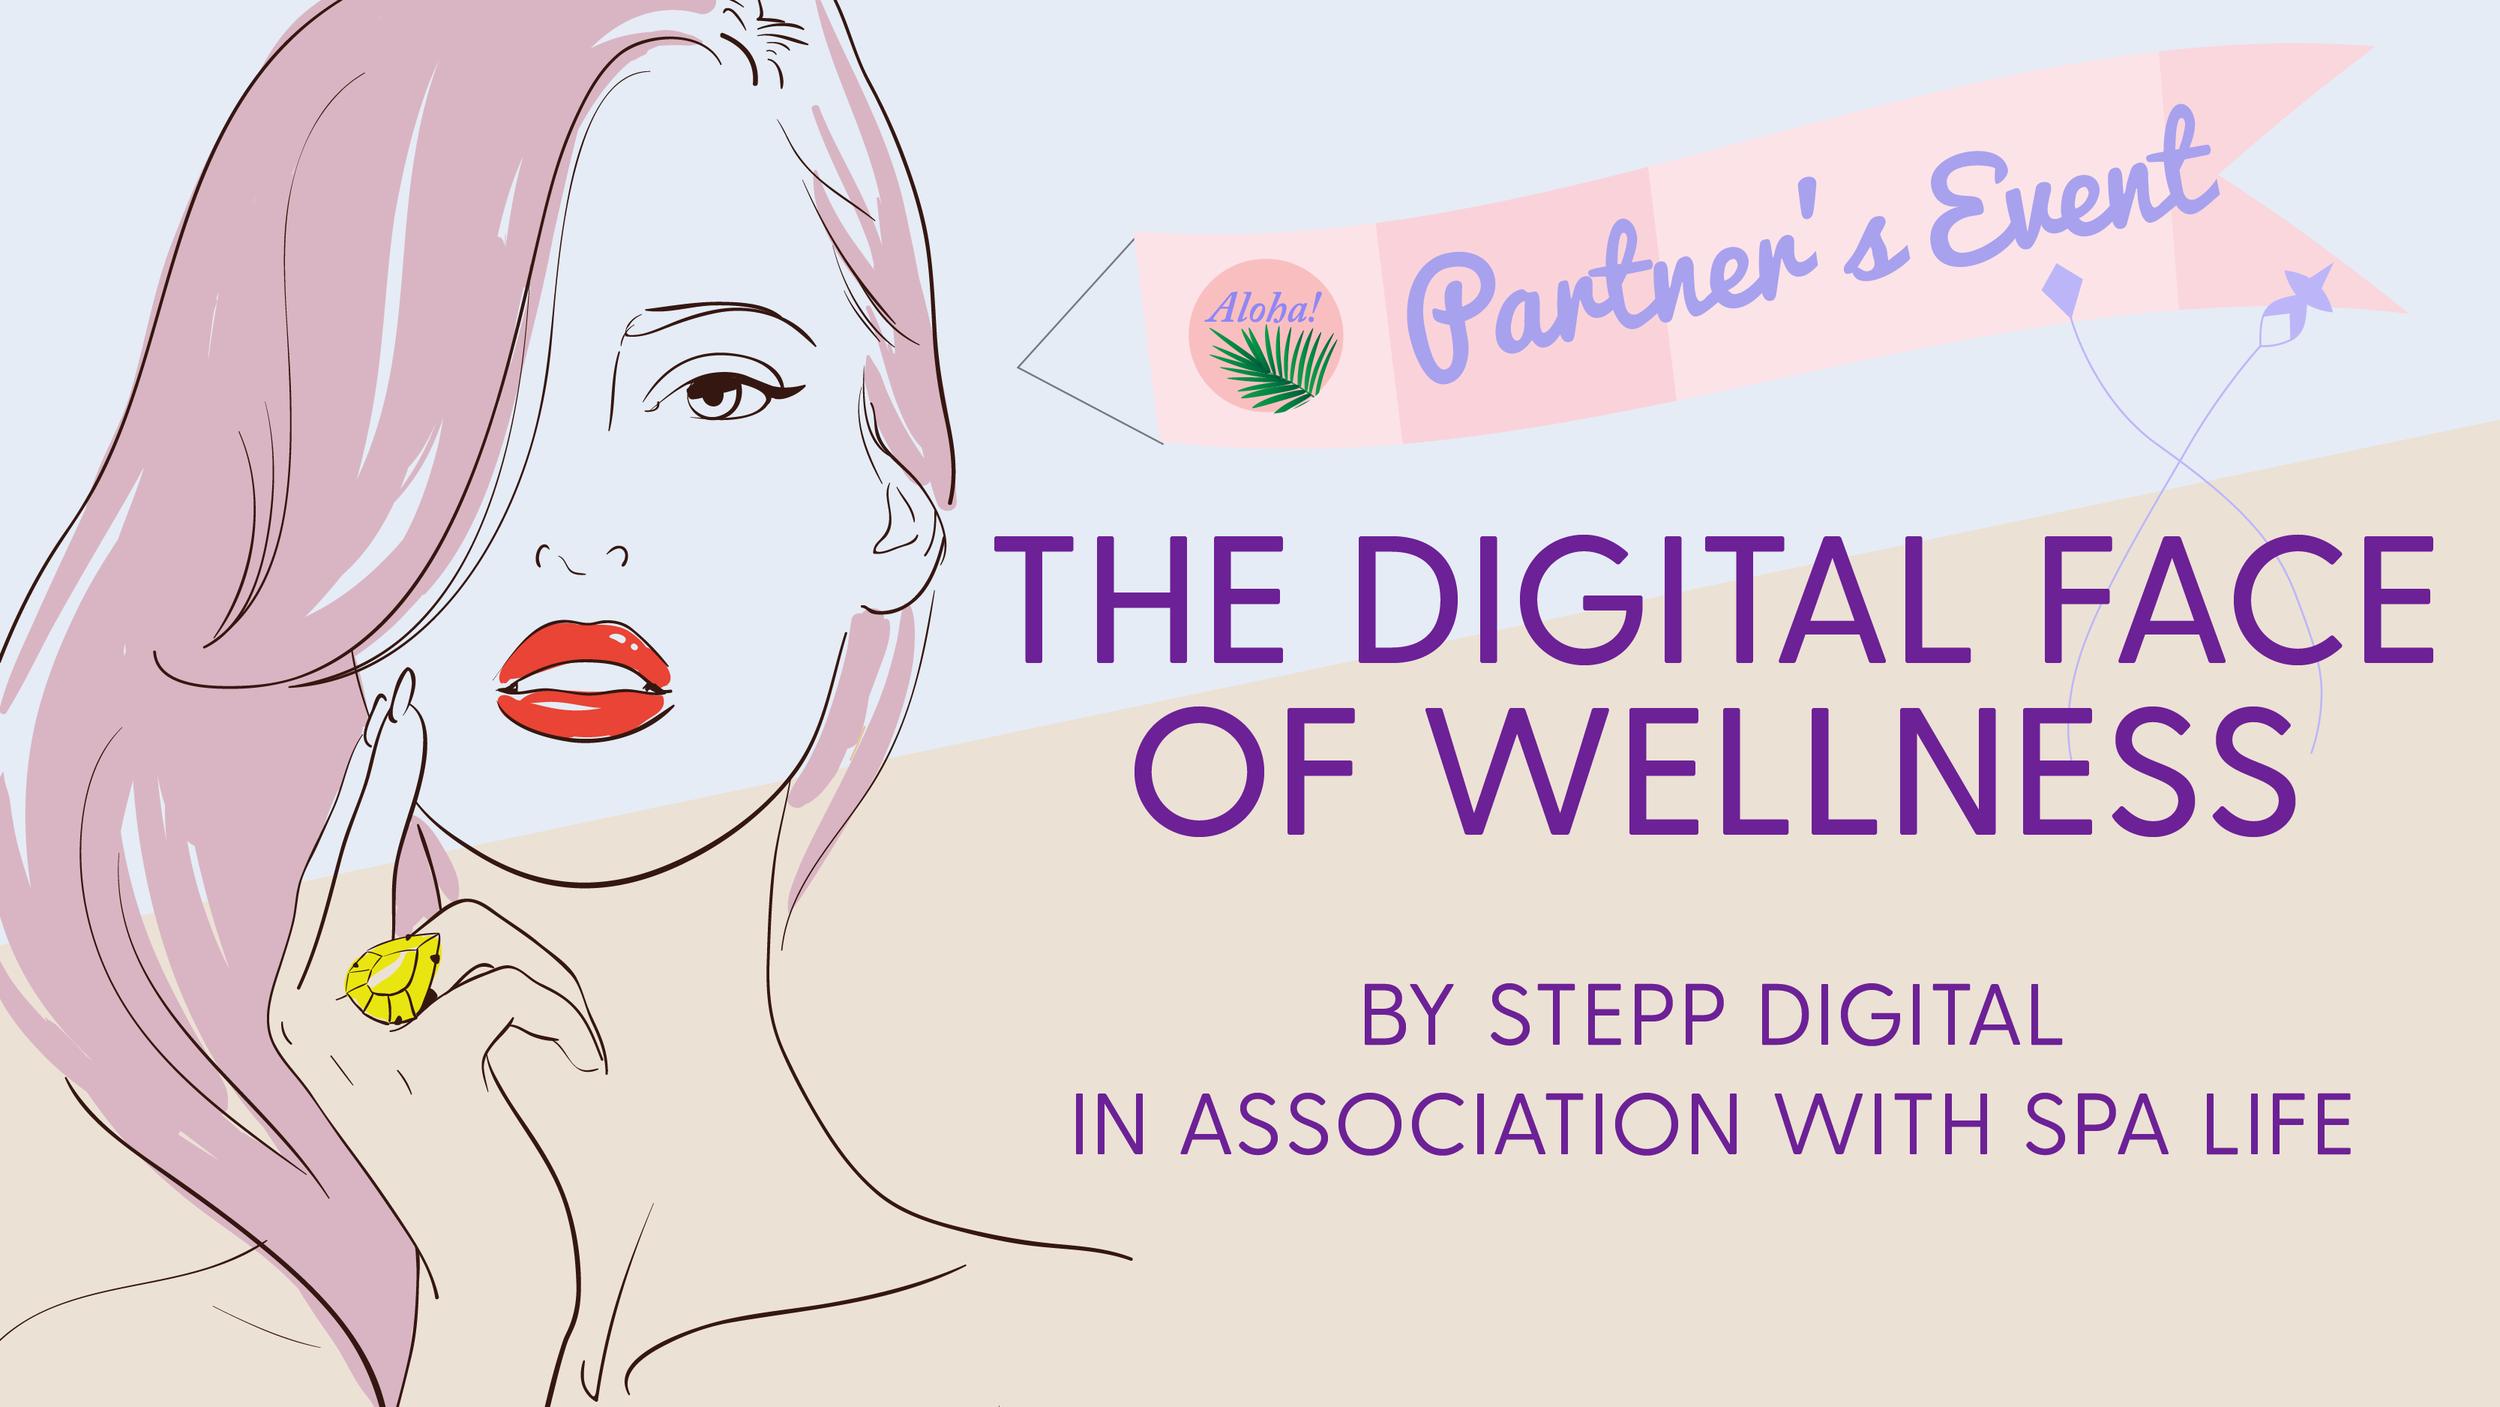 DigitalFaceWellness_partner_1600px_1.png